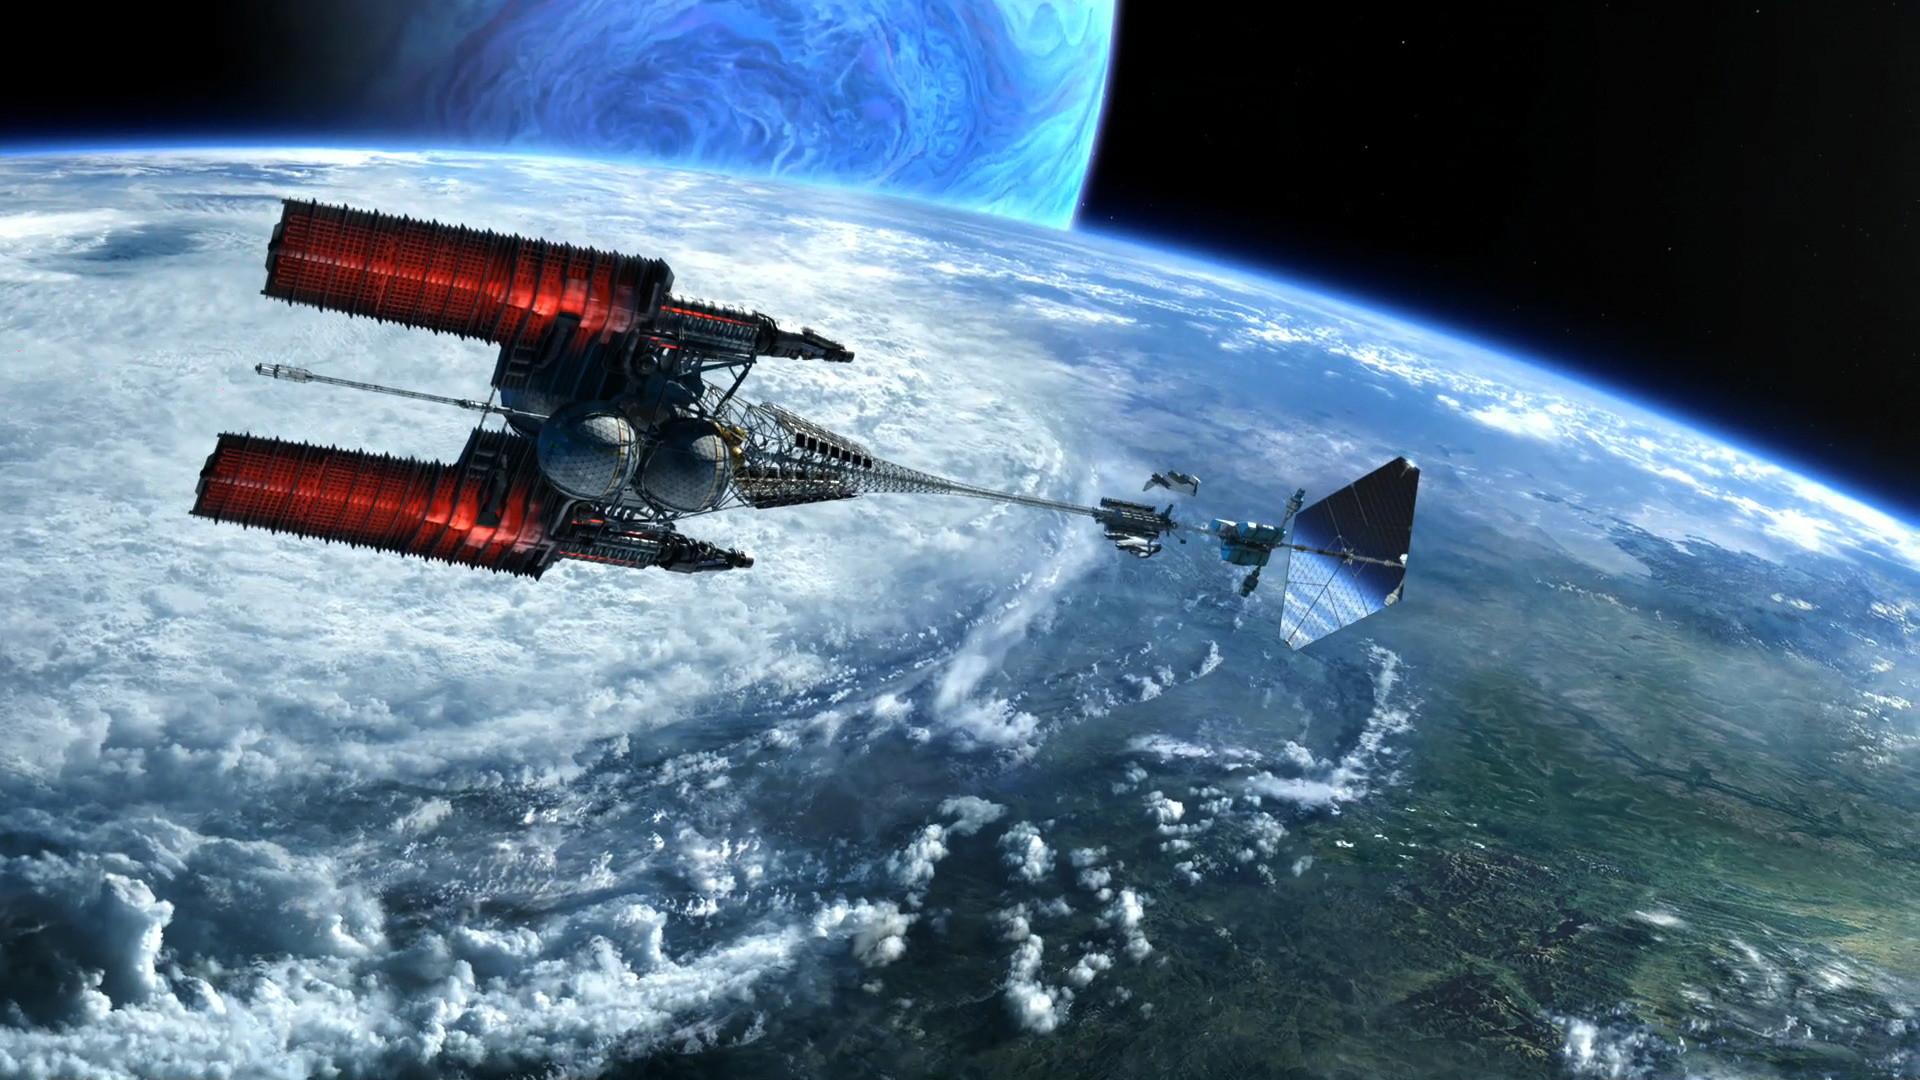 Preview Spaceship over Pandora orbit